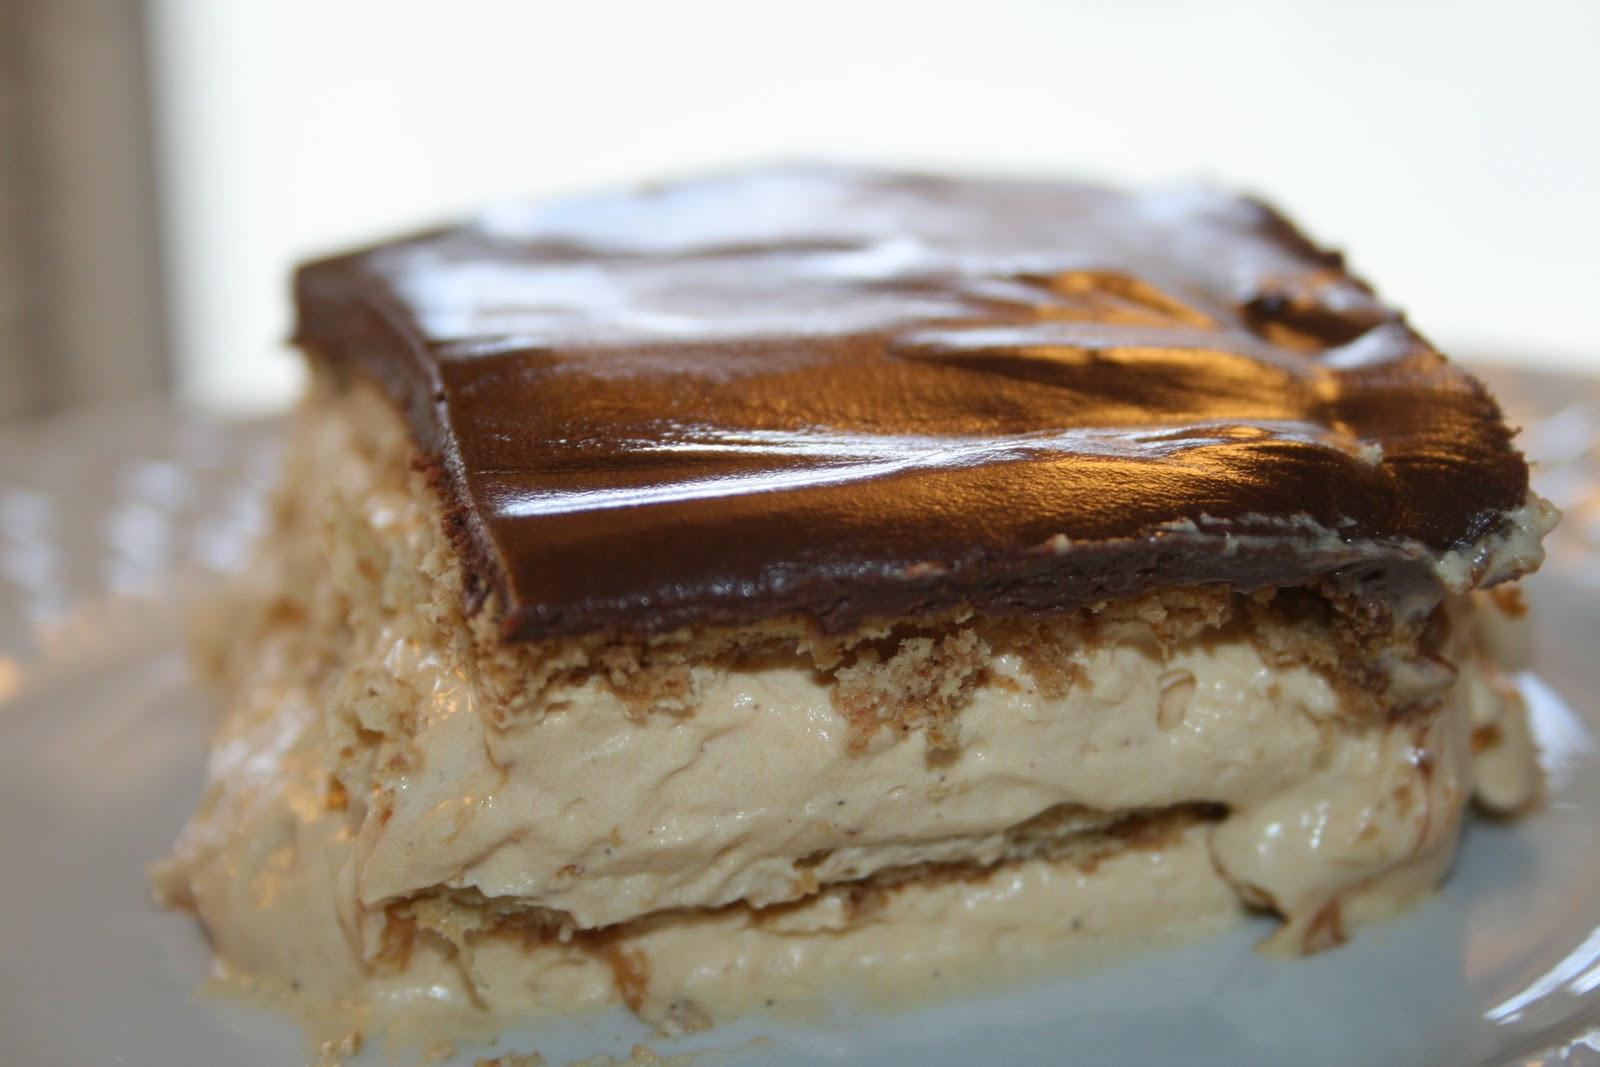 Chocolate Eclair Cake Recipe  SusieQTpies Cafe Gingerbread Chocolate Eclair Dessert Recipe